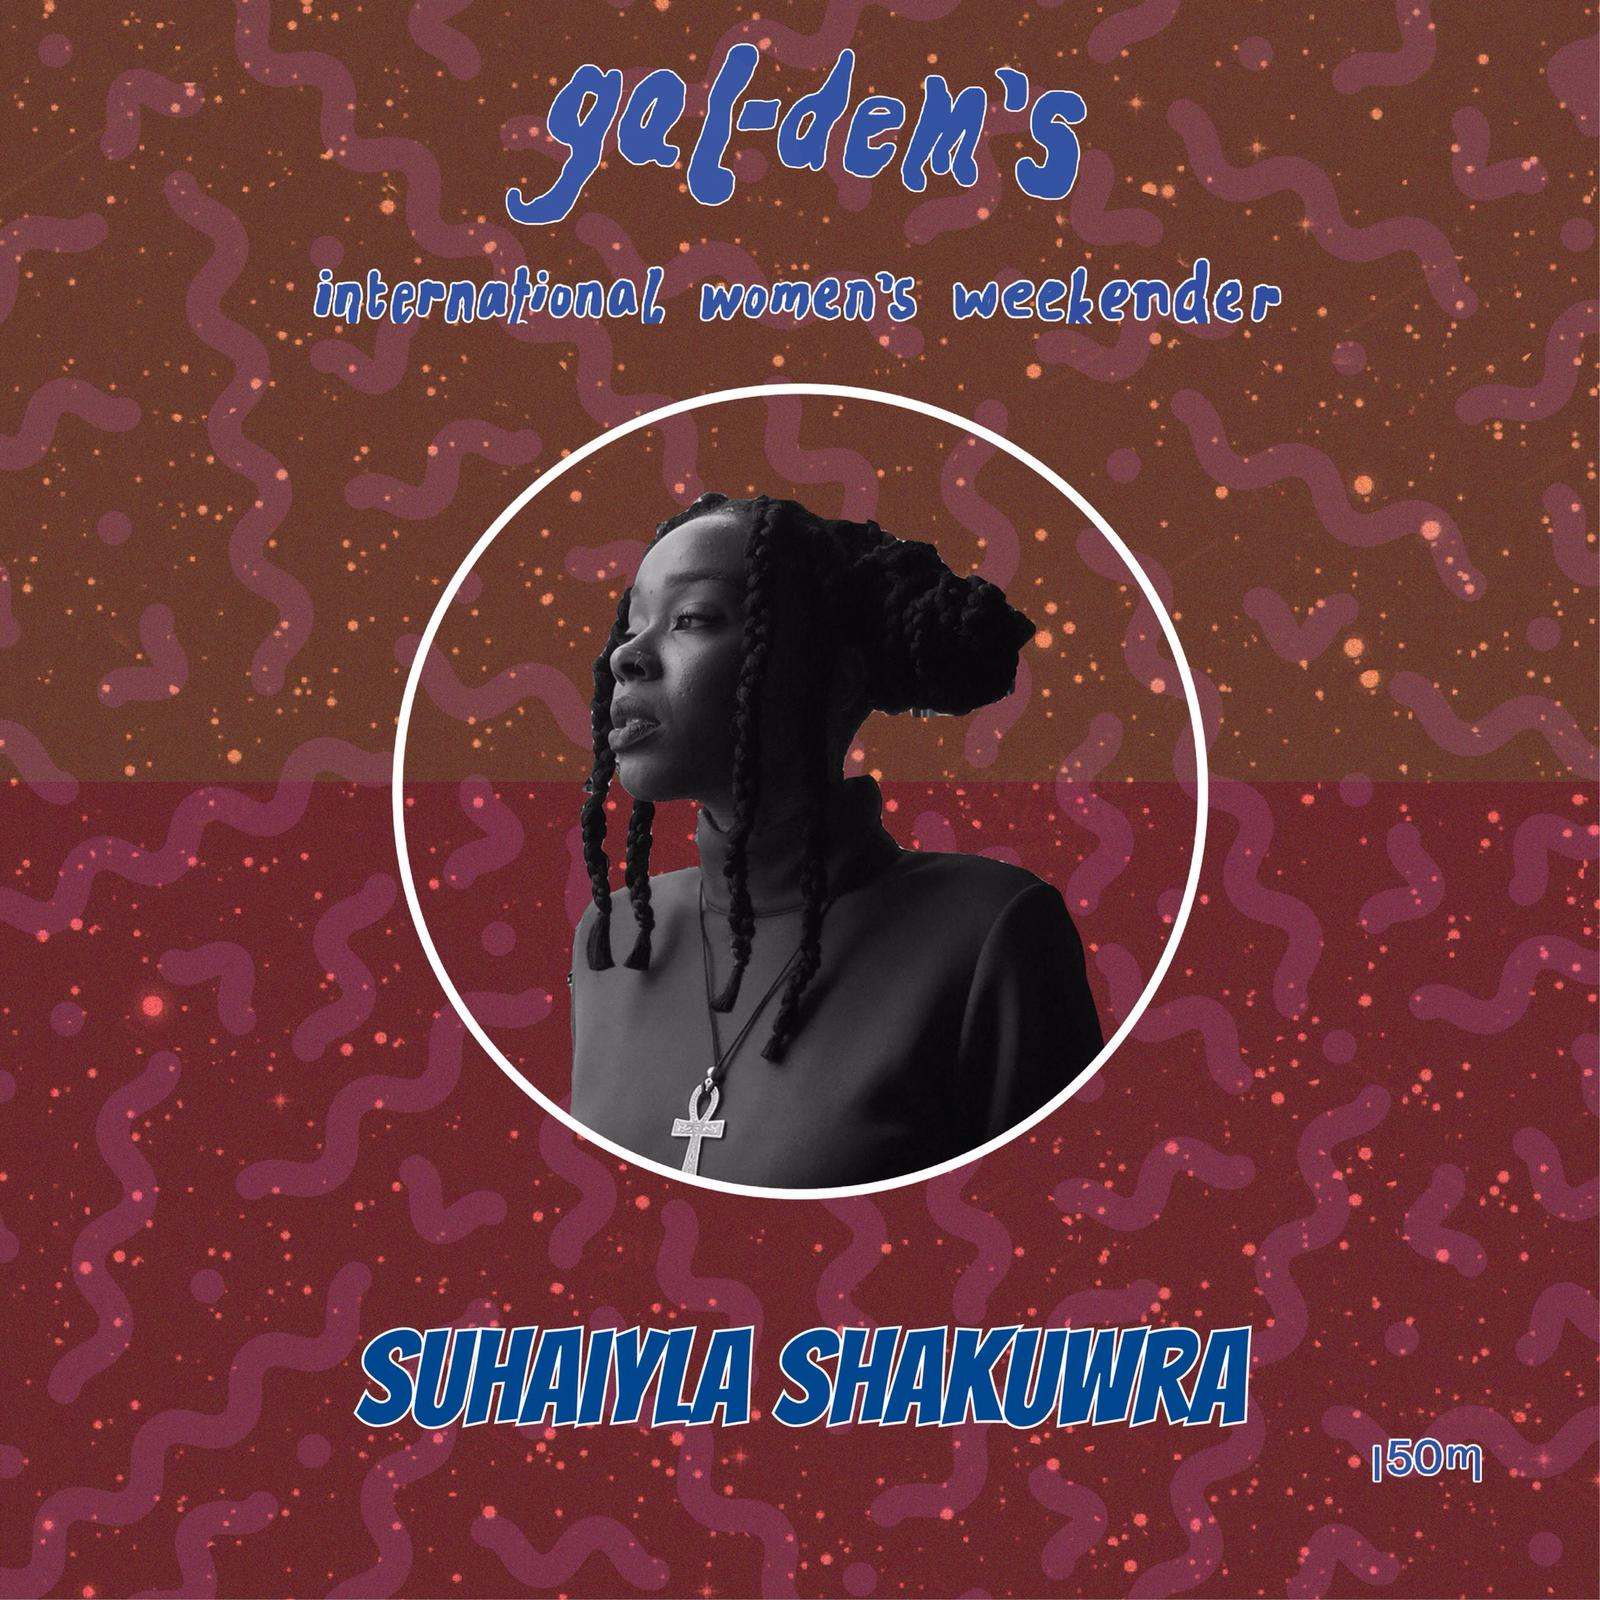 The Art of Being Present w/ Suhaiyla Shakuwra